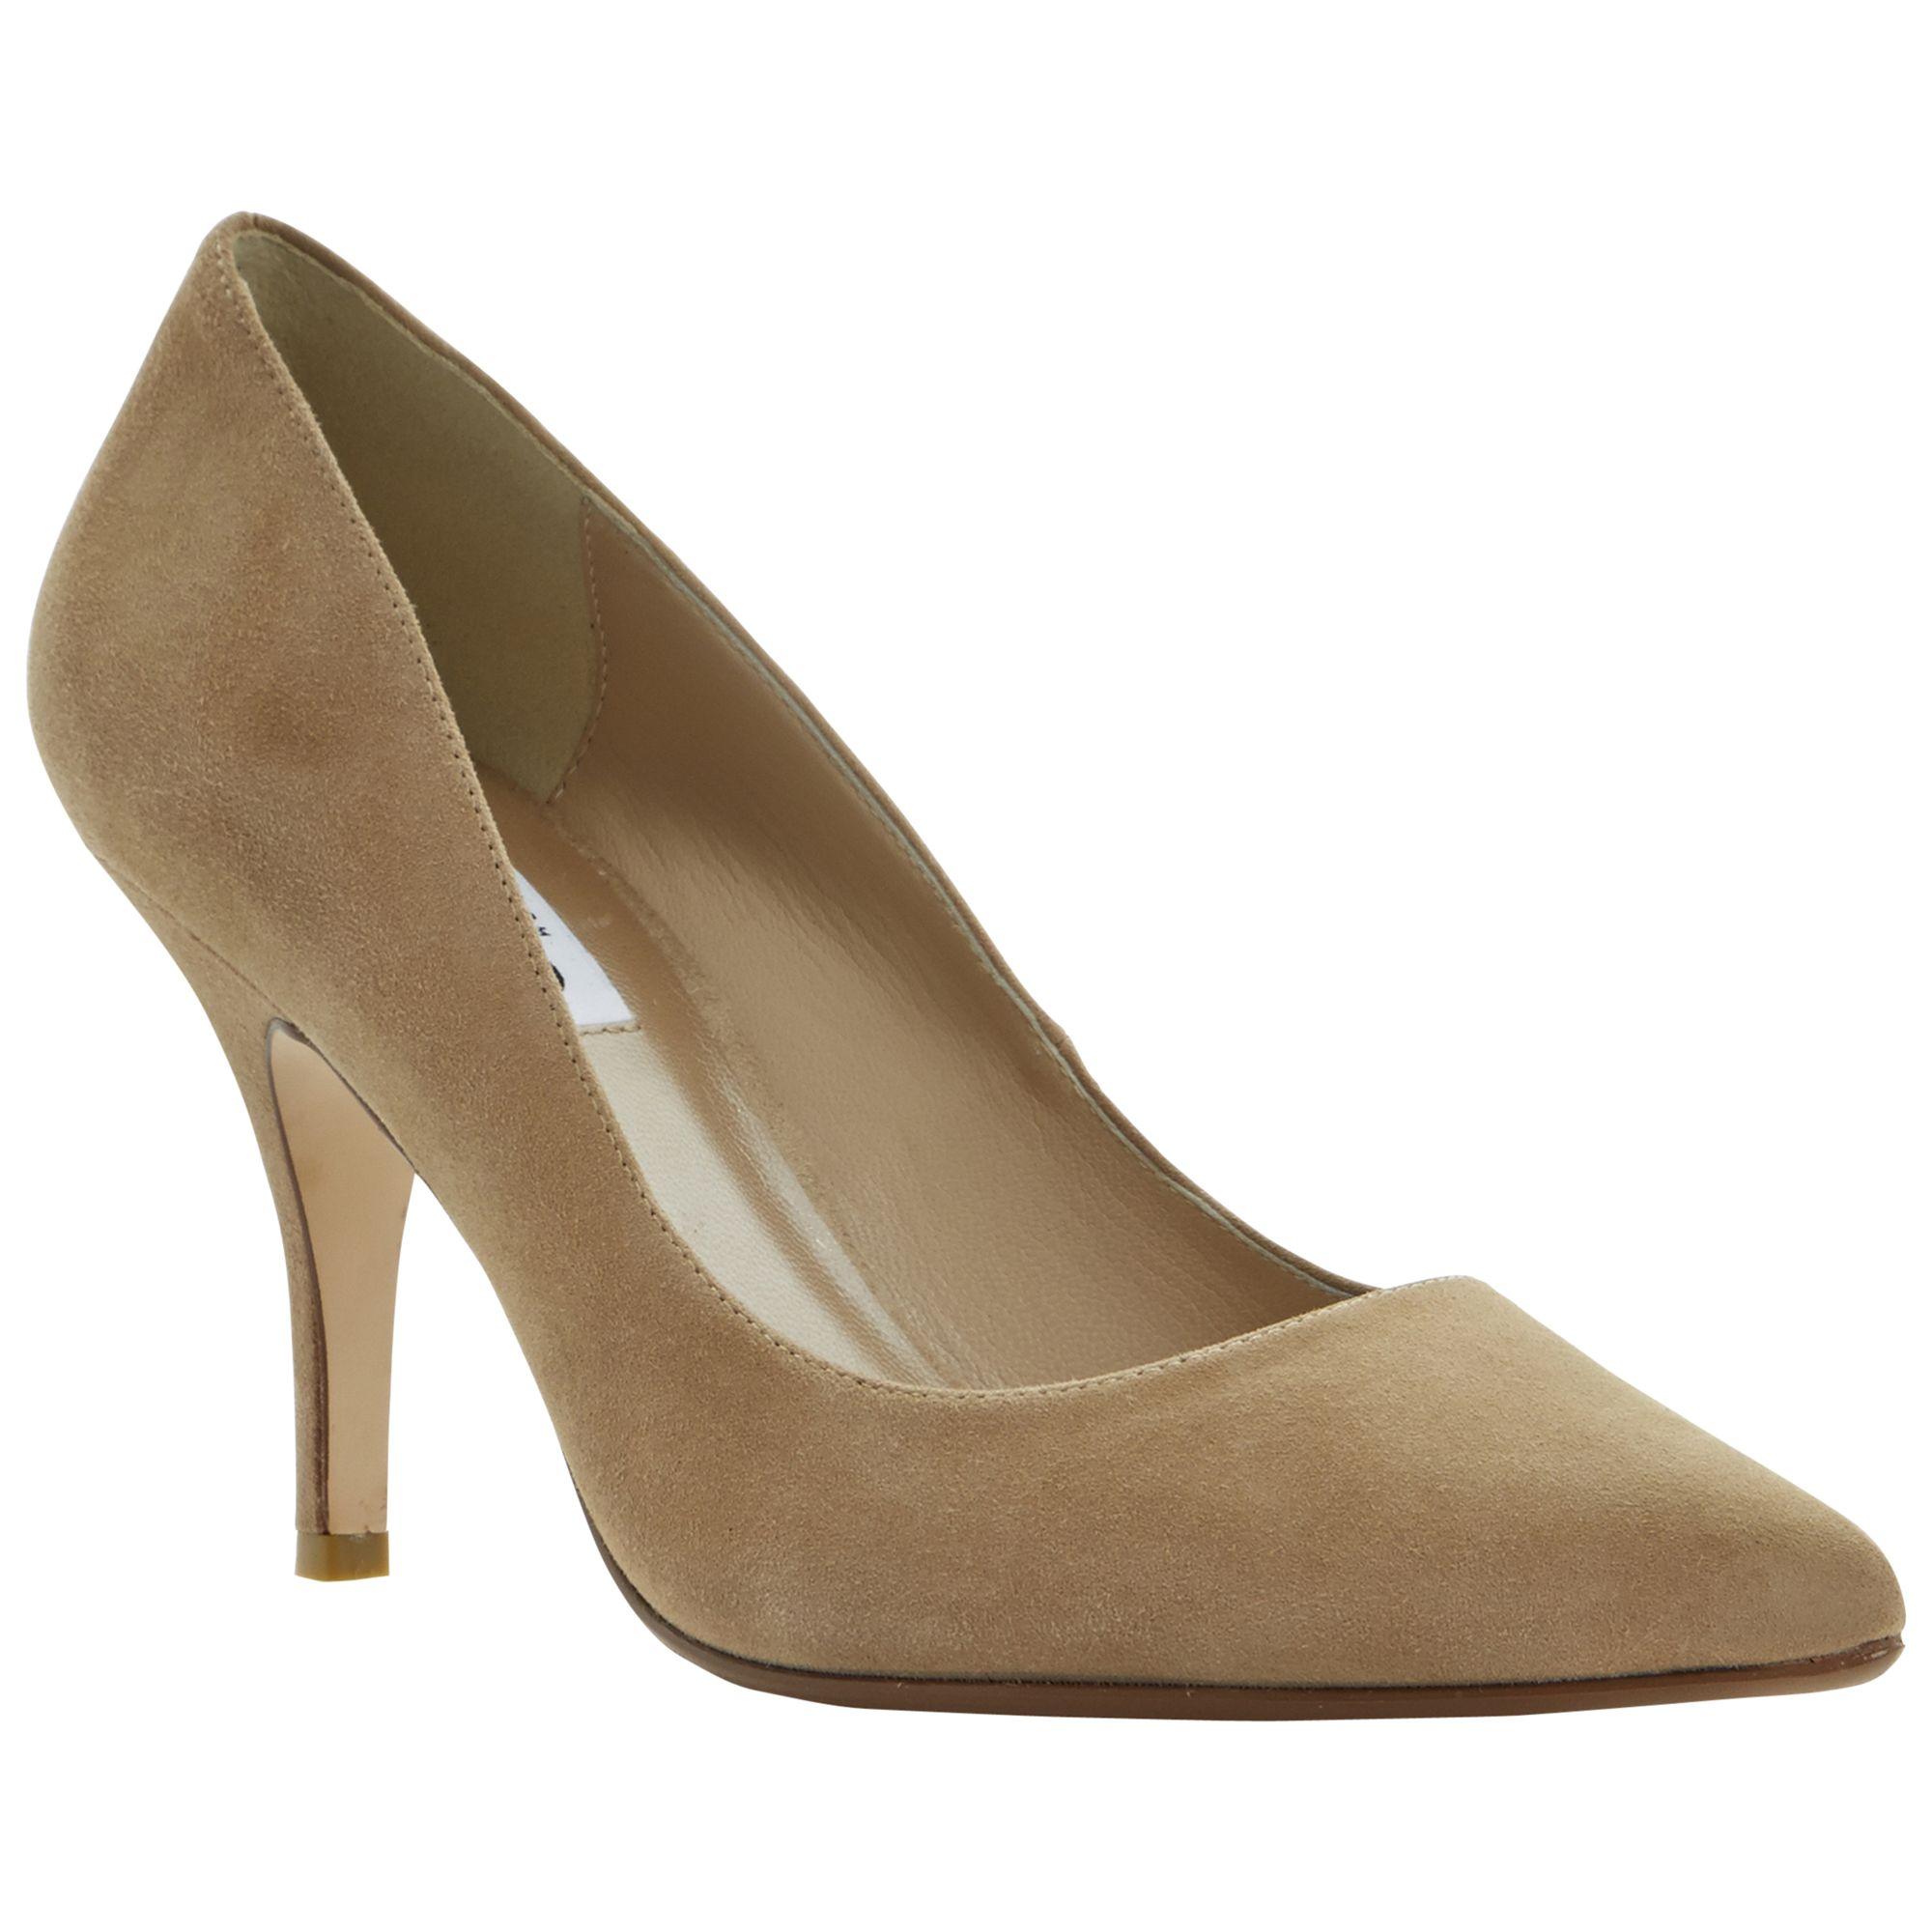 Dune Appoint Court Shoes, Mink